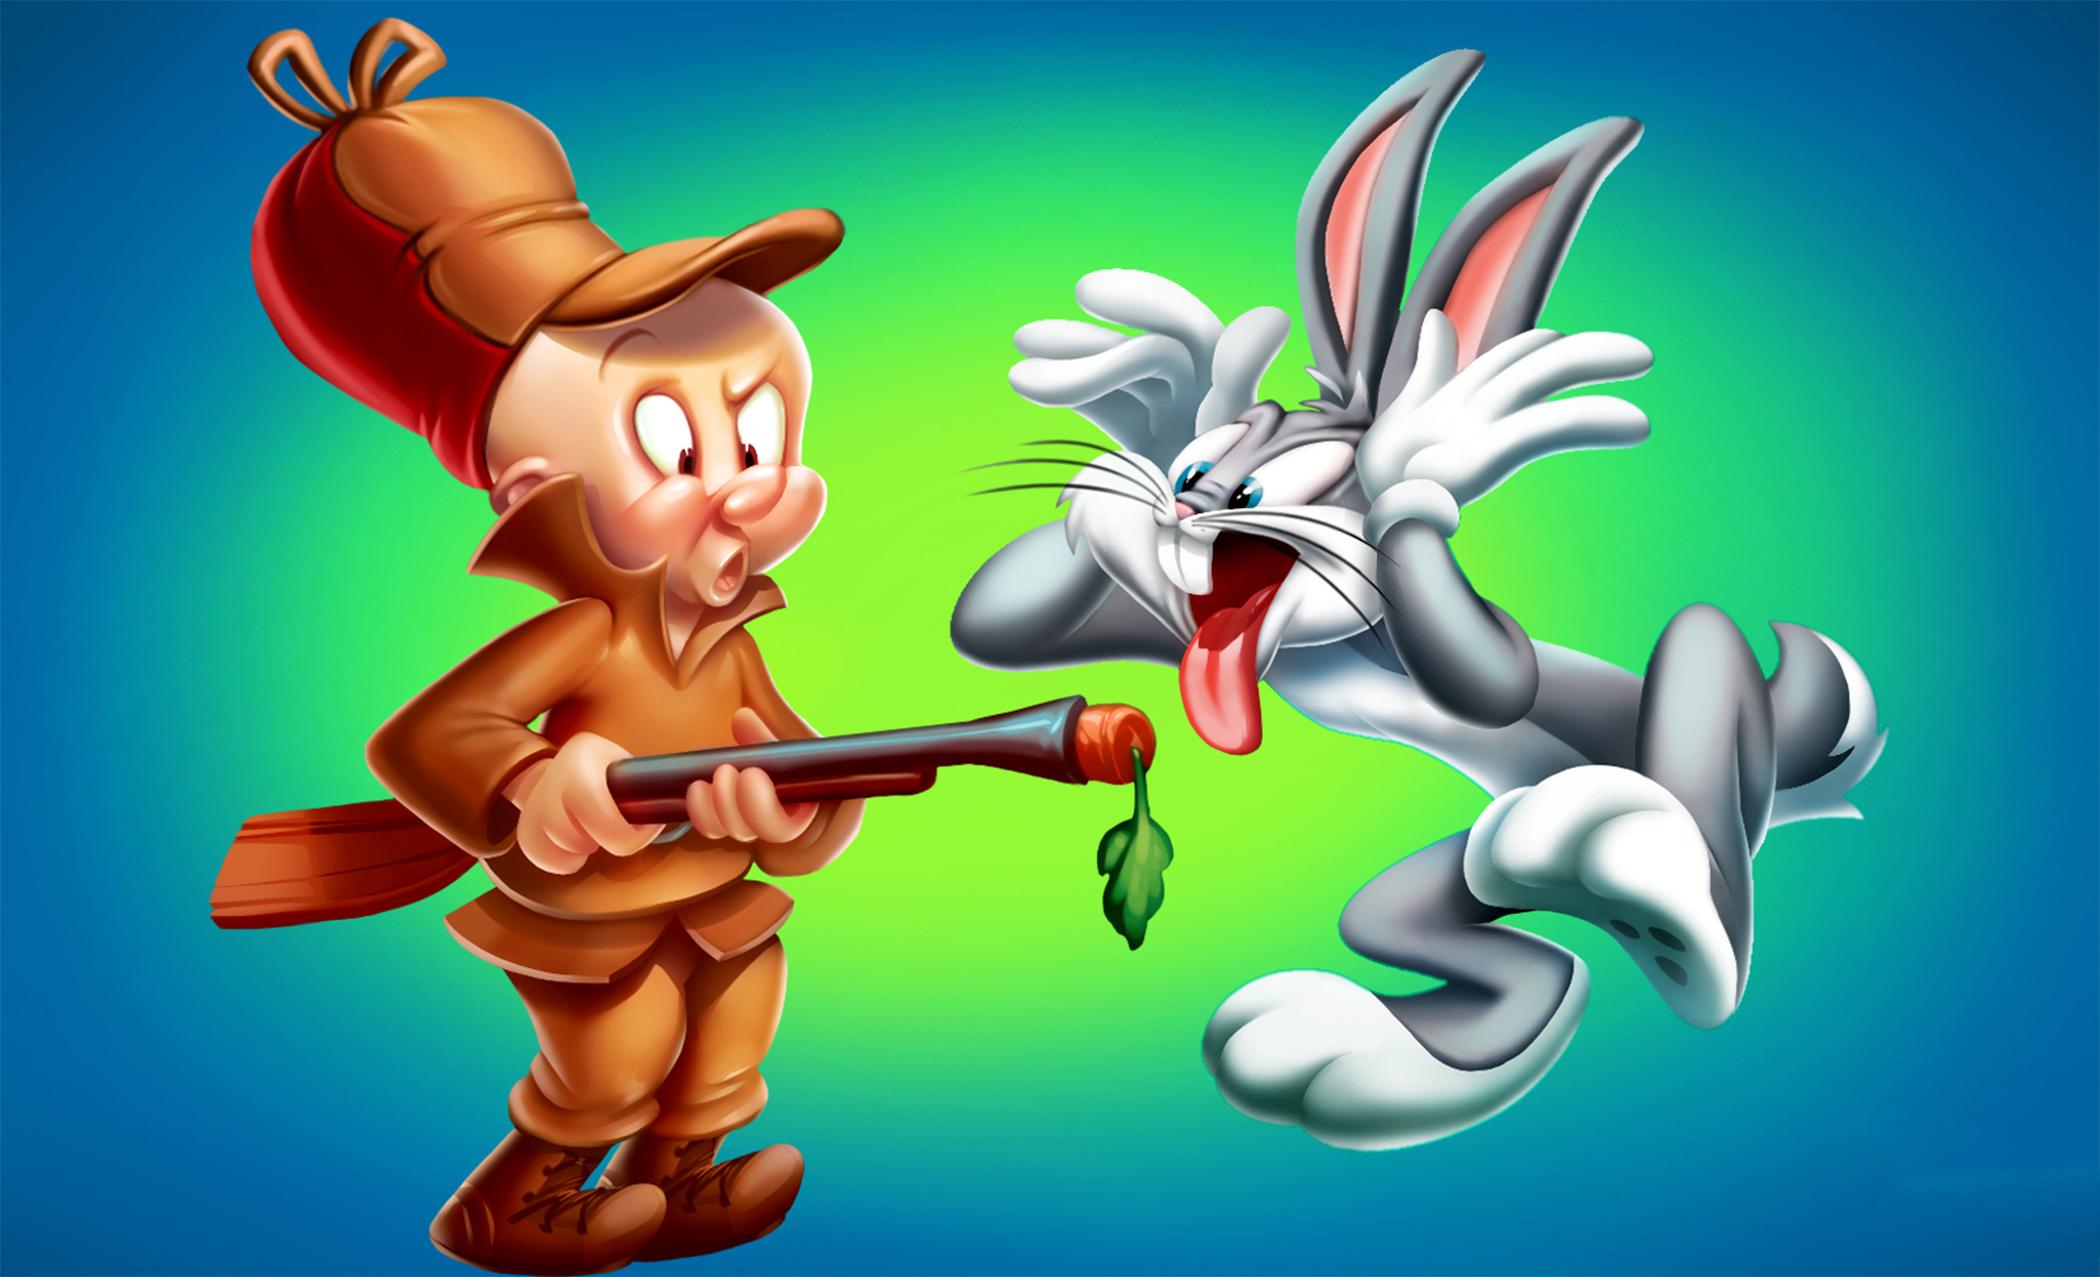 Looney Tunes Artwork, HD Artist, 4k Wallpapers, Images ...